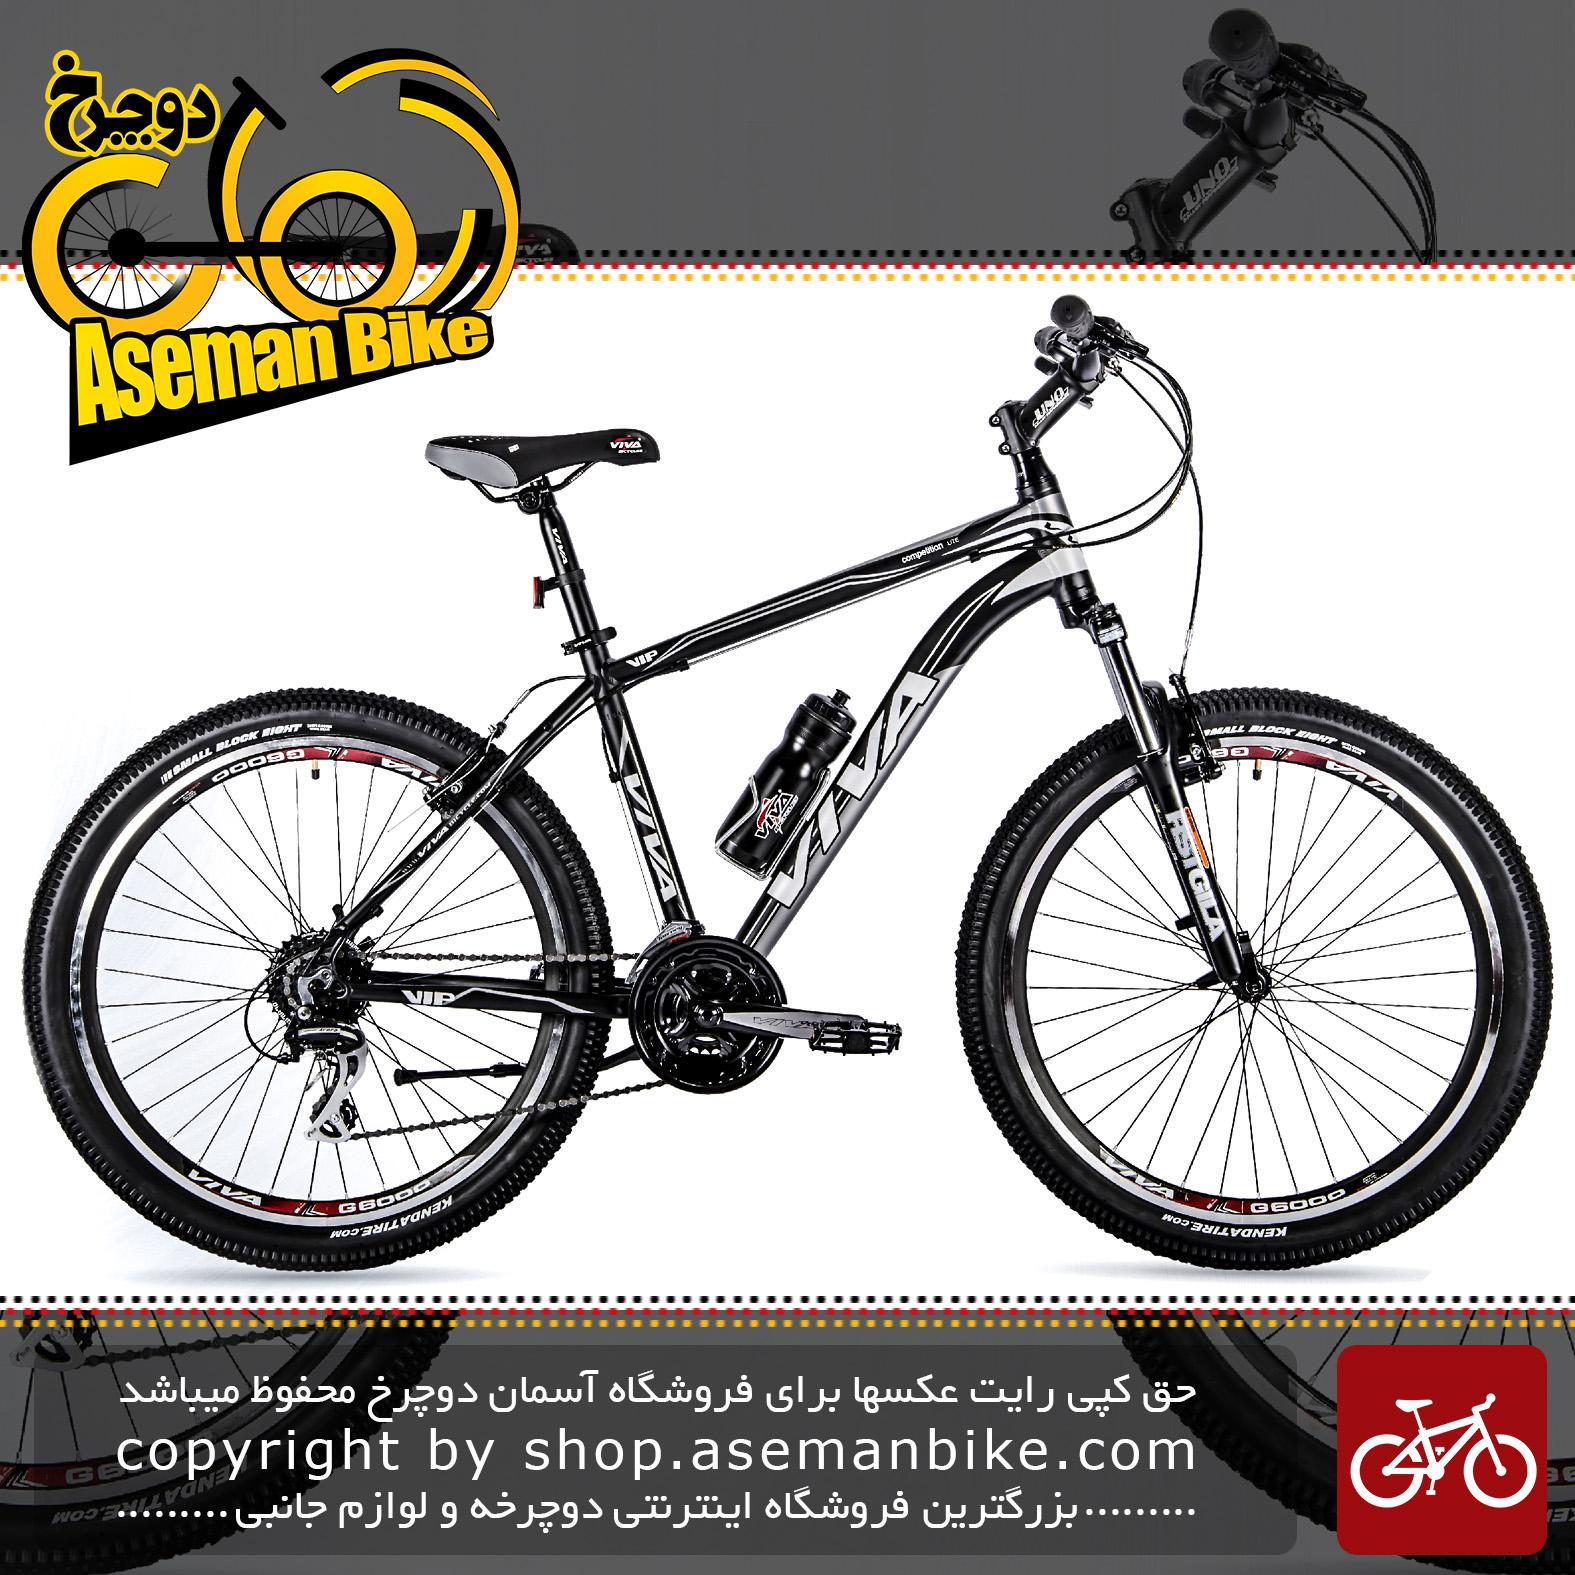 دوچرخه کوهستان شهری ویوا مدل وی آی پی 24 دنده شیمانو سایز 26 Viva Mountain City Bicycle VIP 18 26 2018